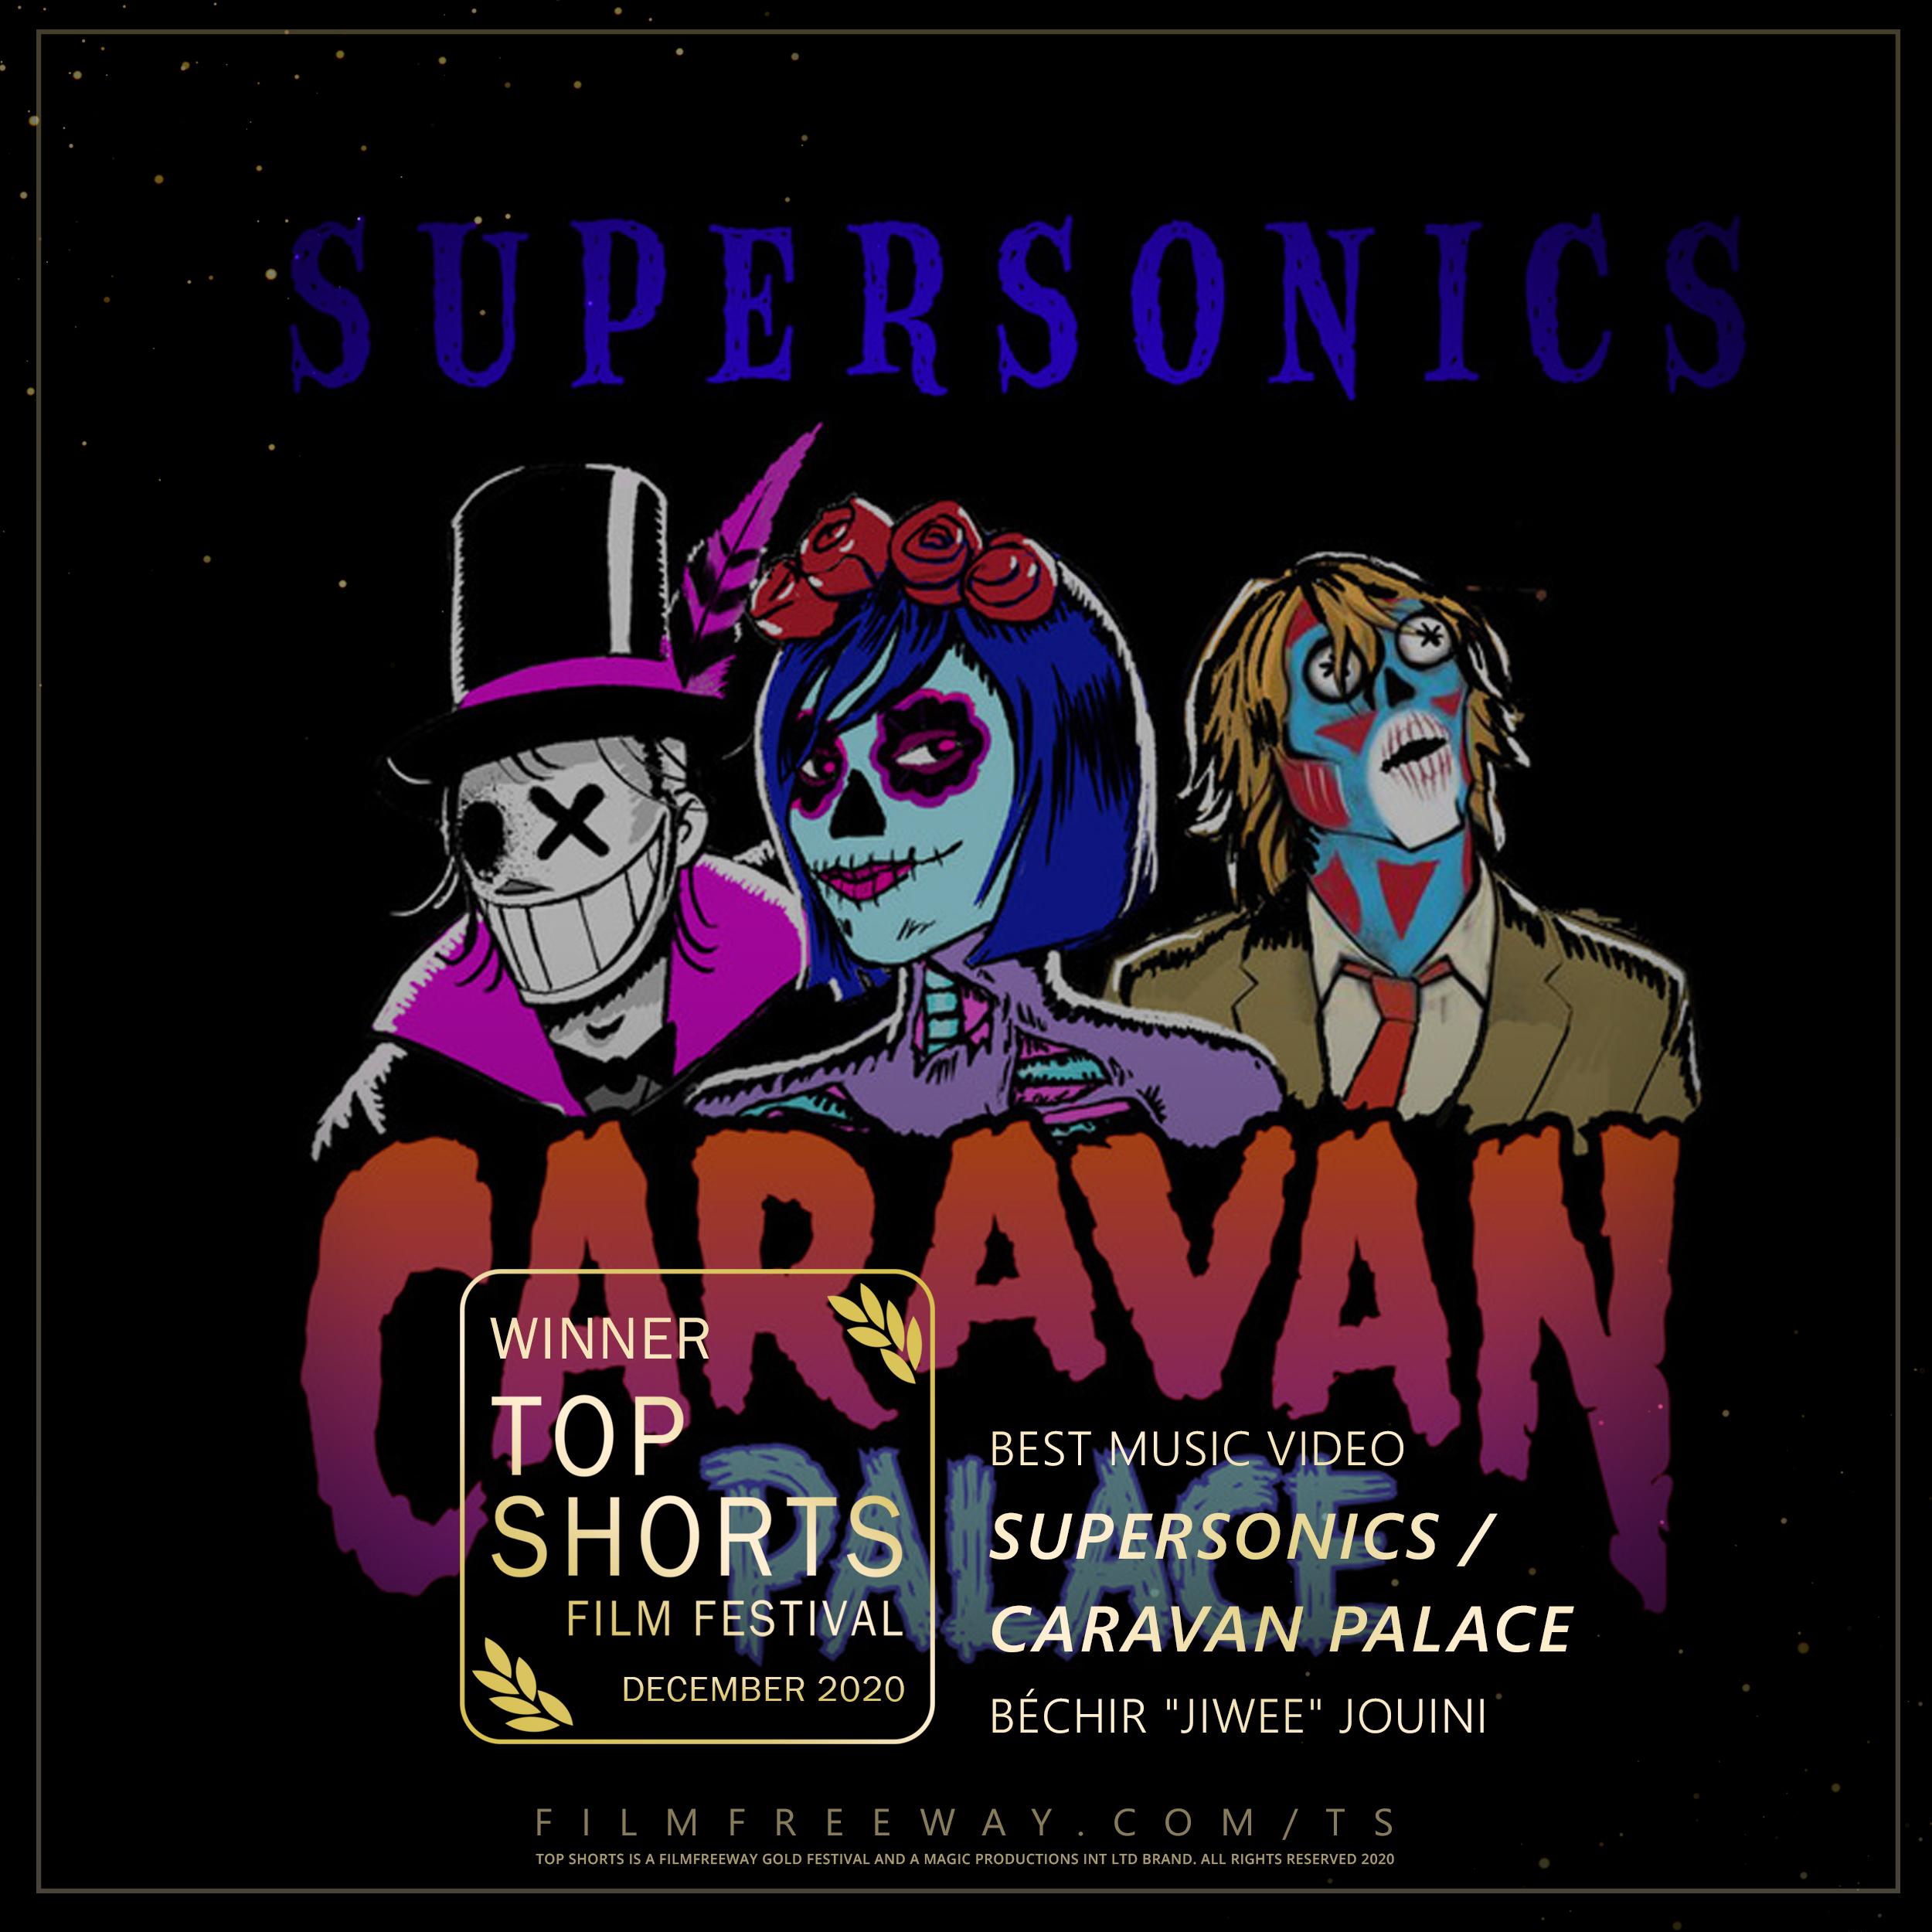 Supersonics Caravan Palace design